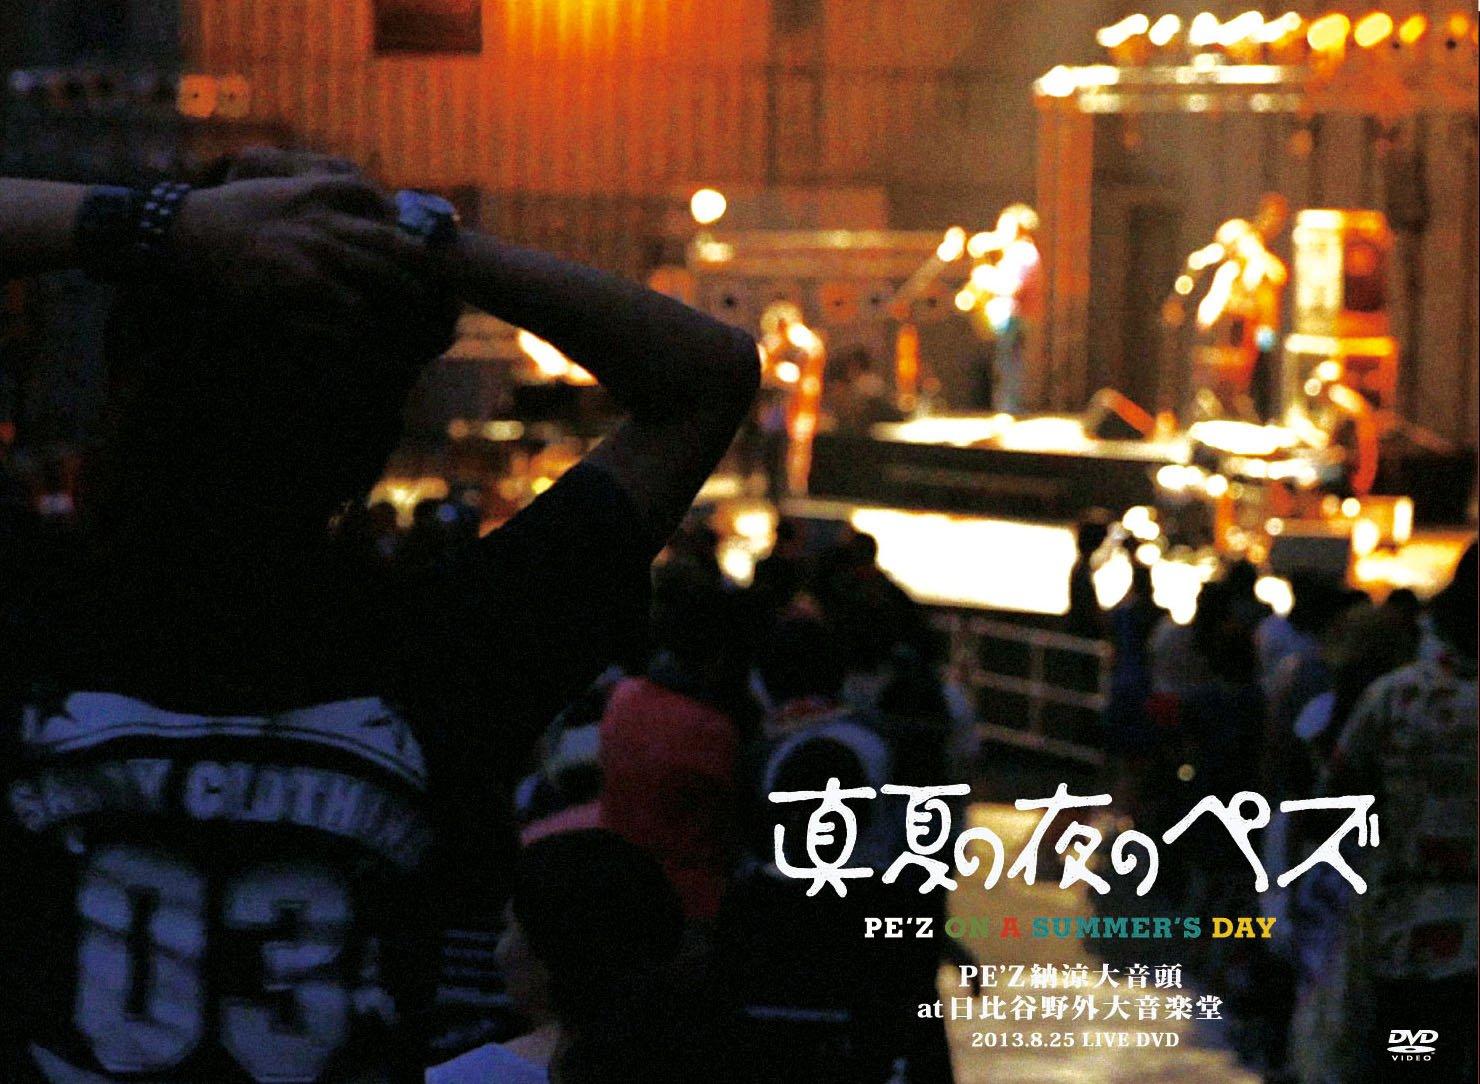 真夏の夜のペズPE'Z納涼大音頭@日比谷野外大音楽堂 2013.8.25 LIVE DVD B00GHACYQA